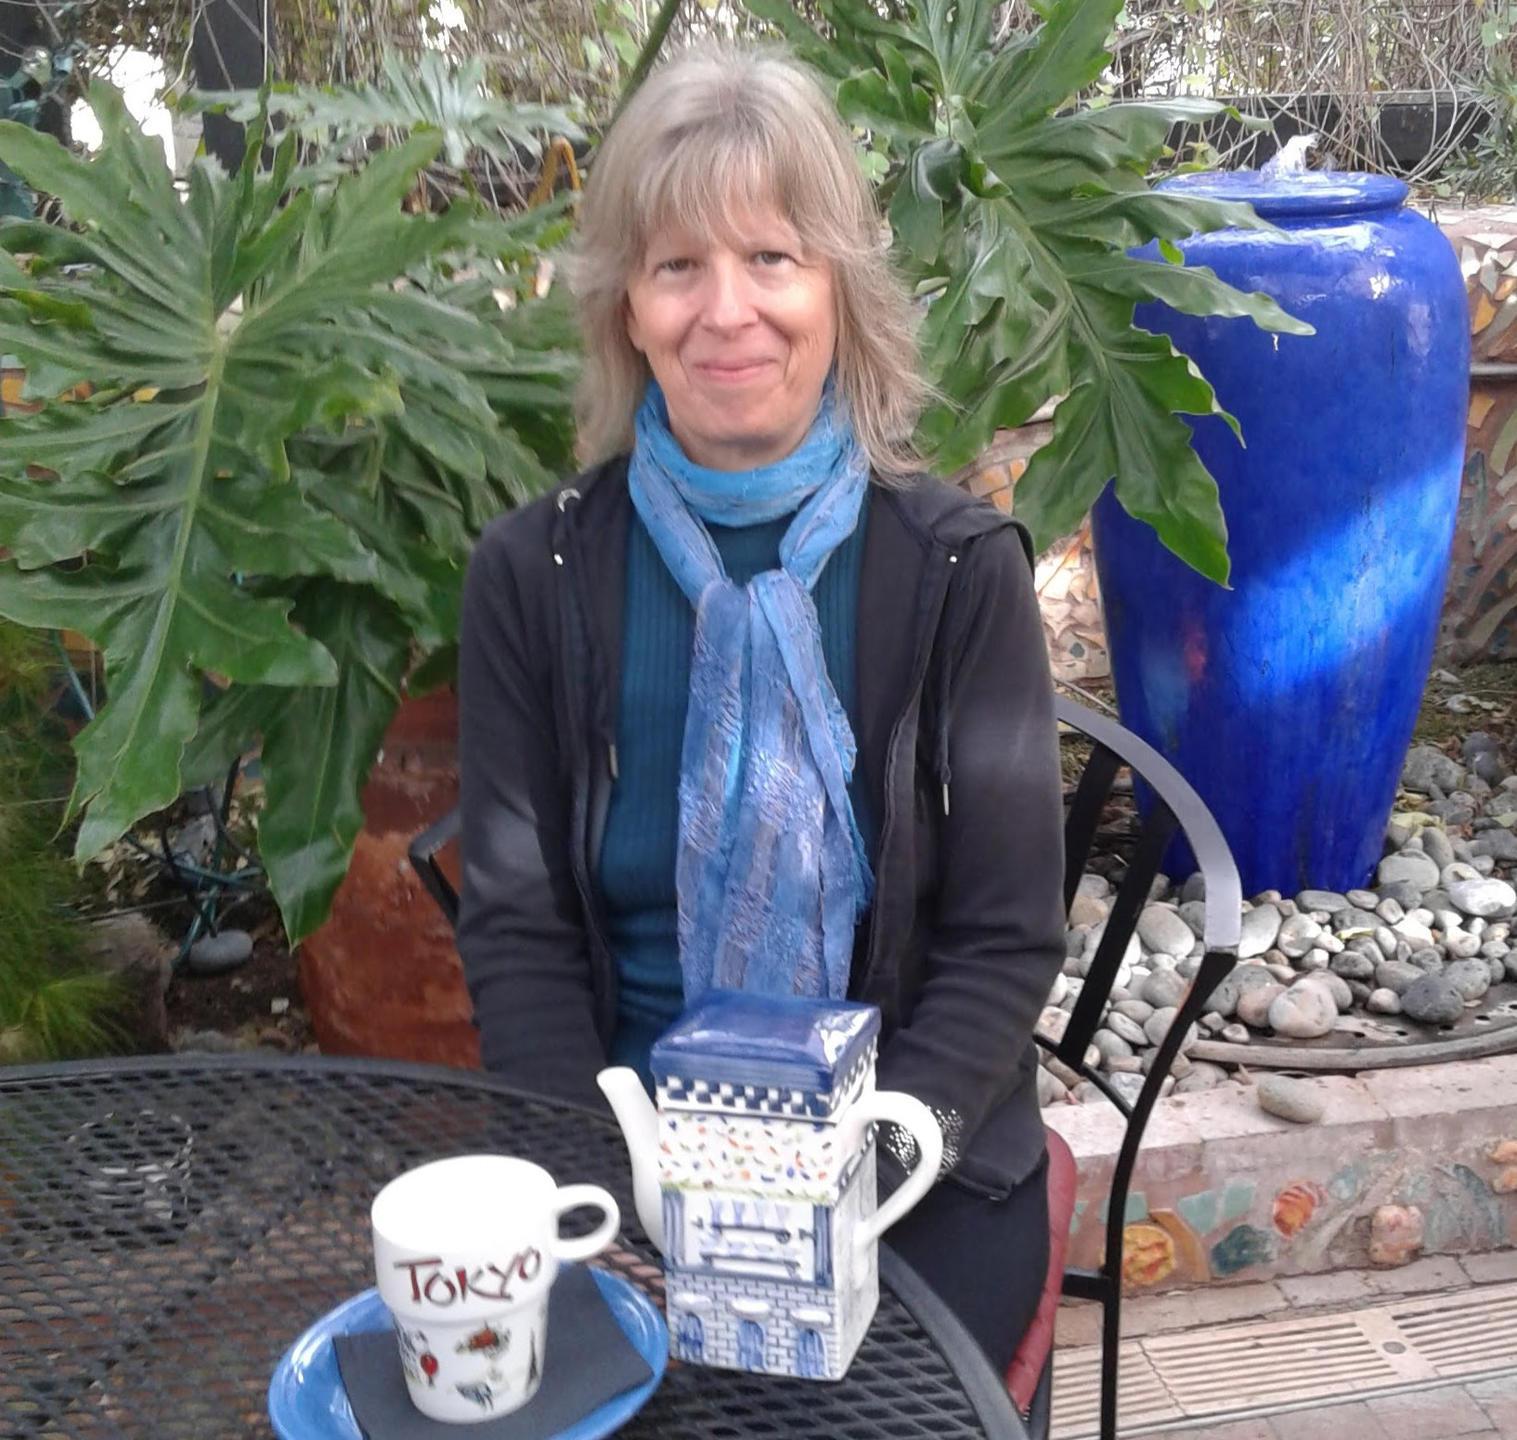 Milli Thornton at tea in Tucson, Arizona